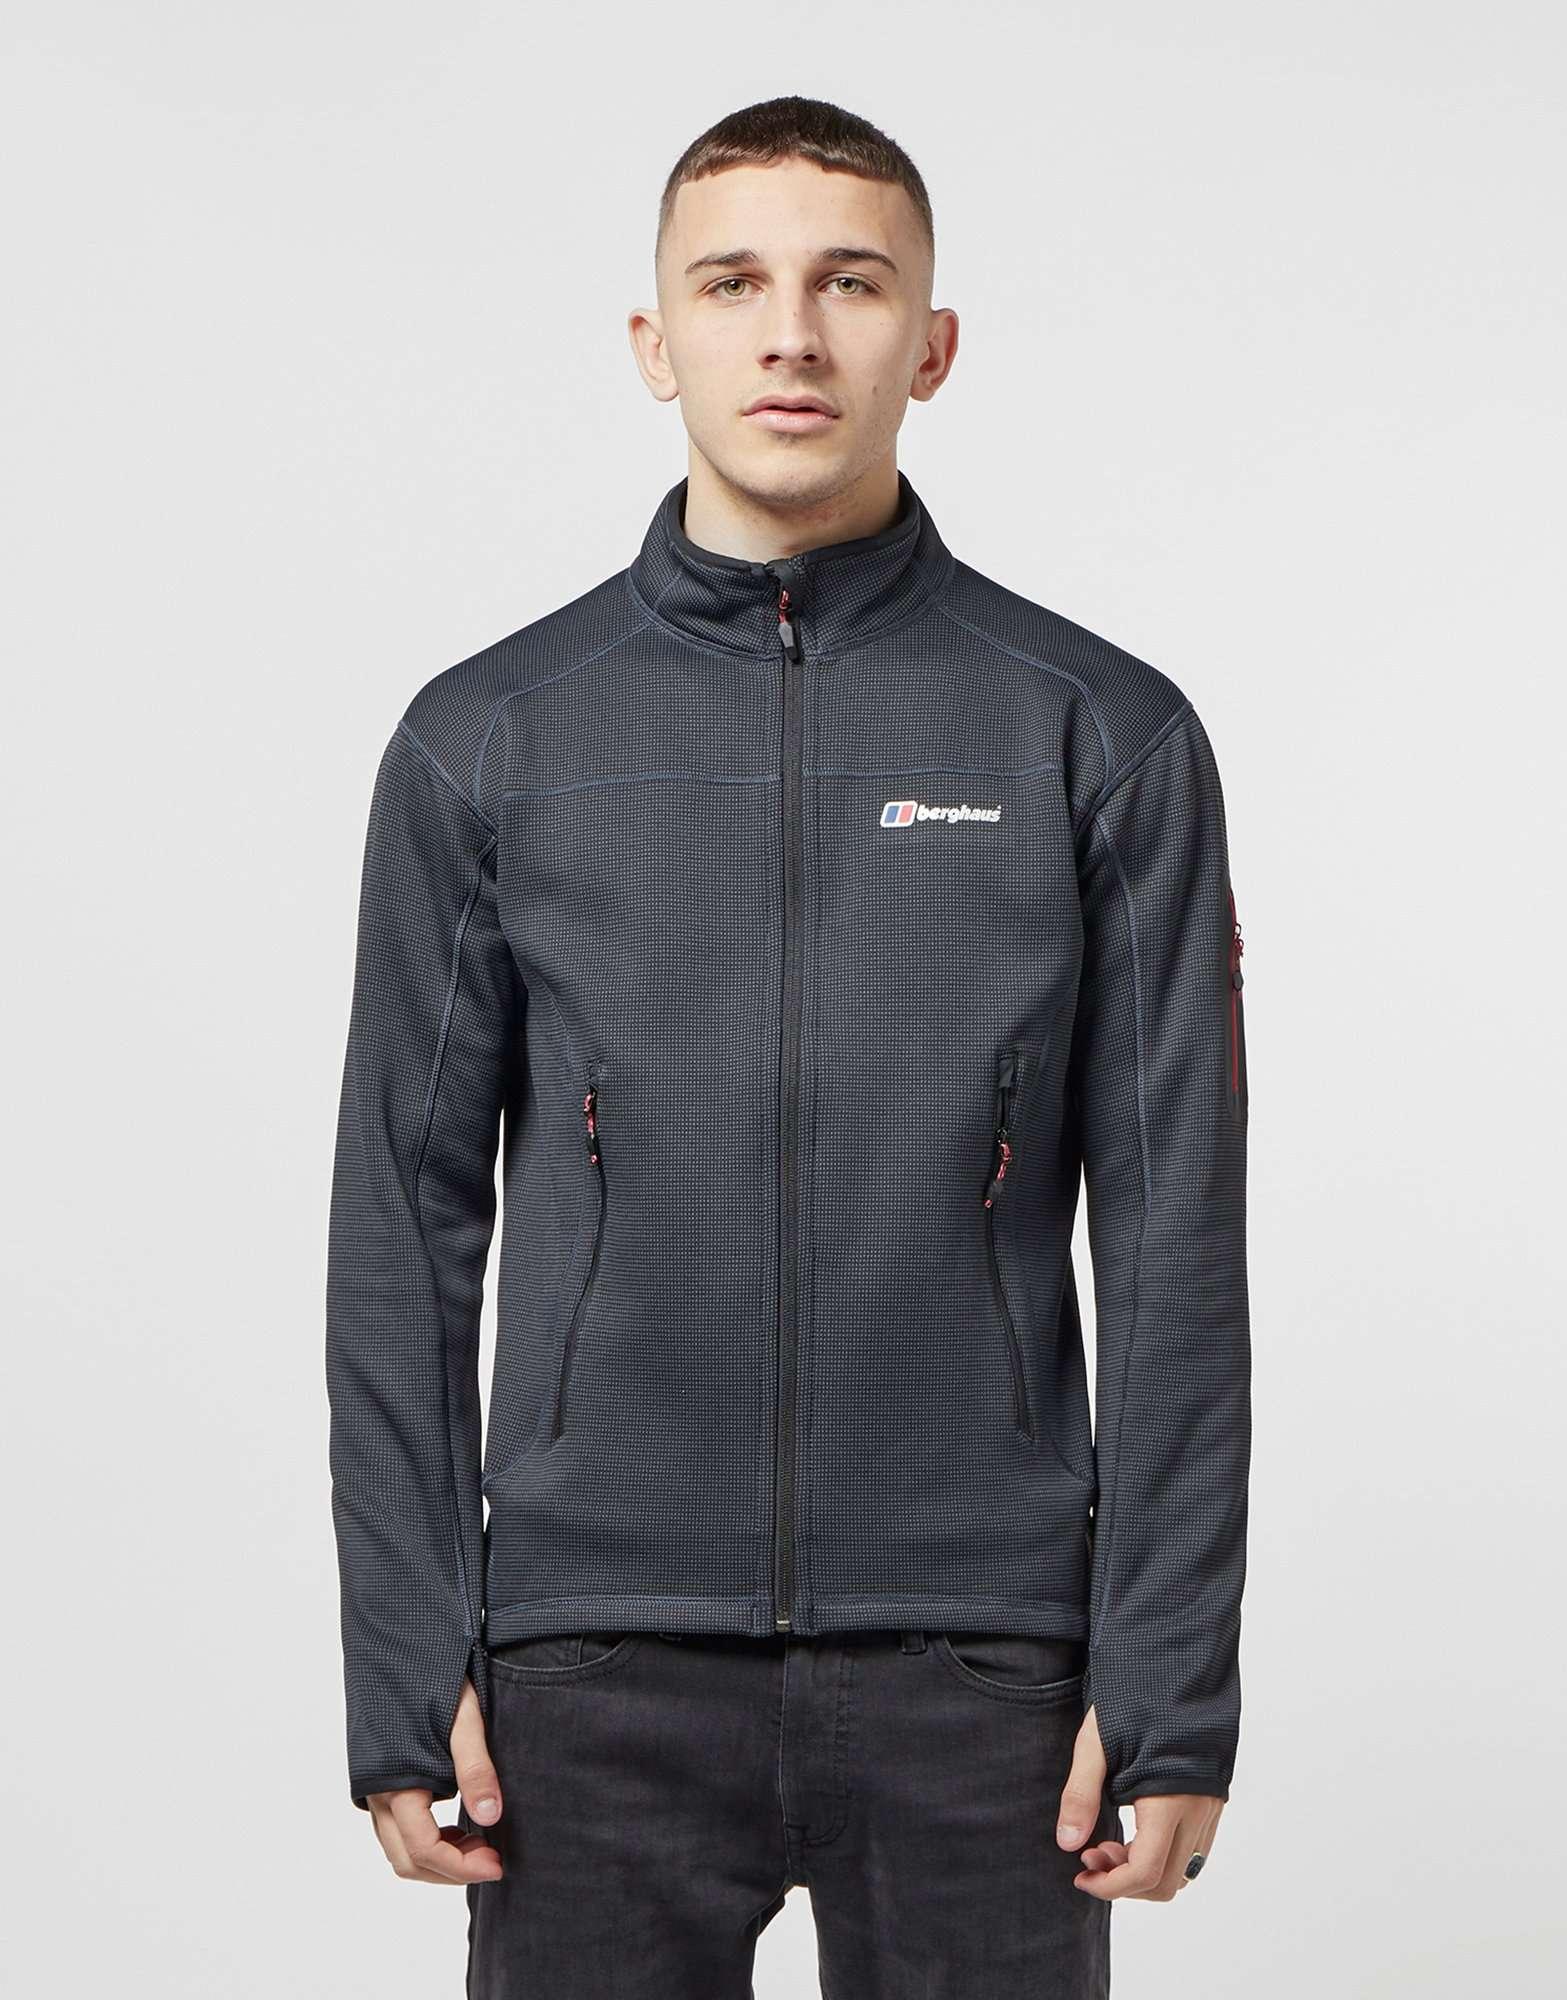 Berghaus Pravitale 2.0 Full Zip Jacket